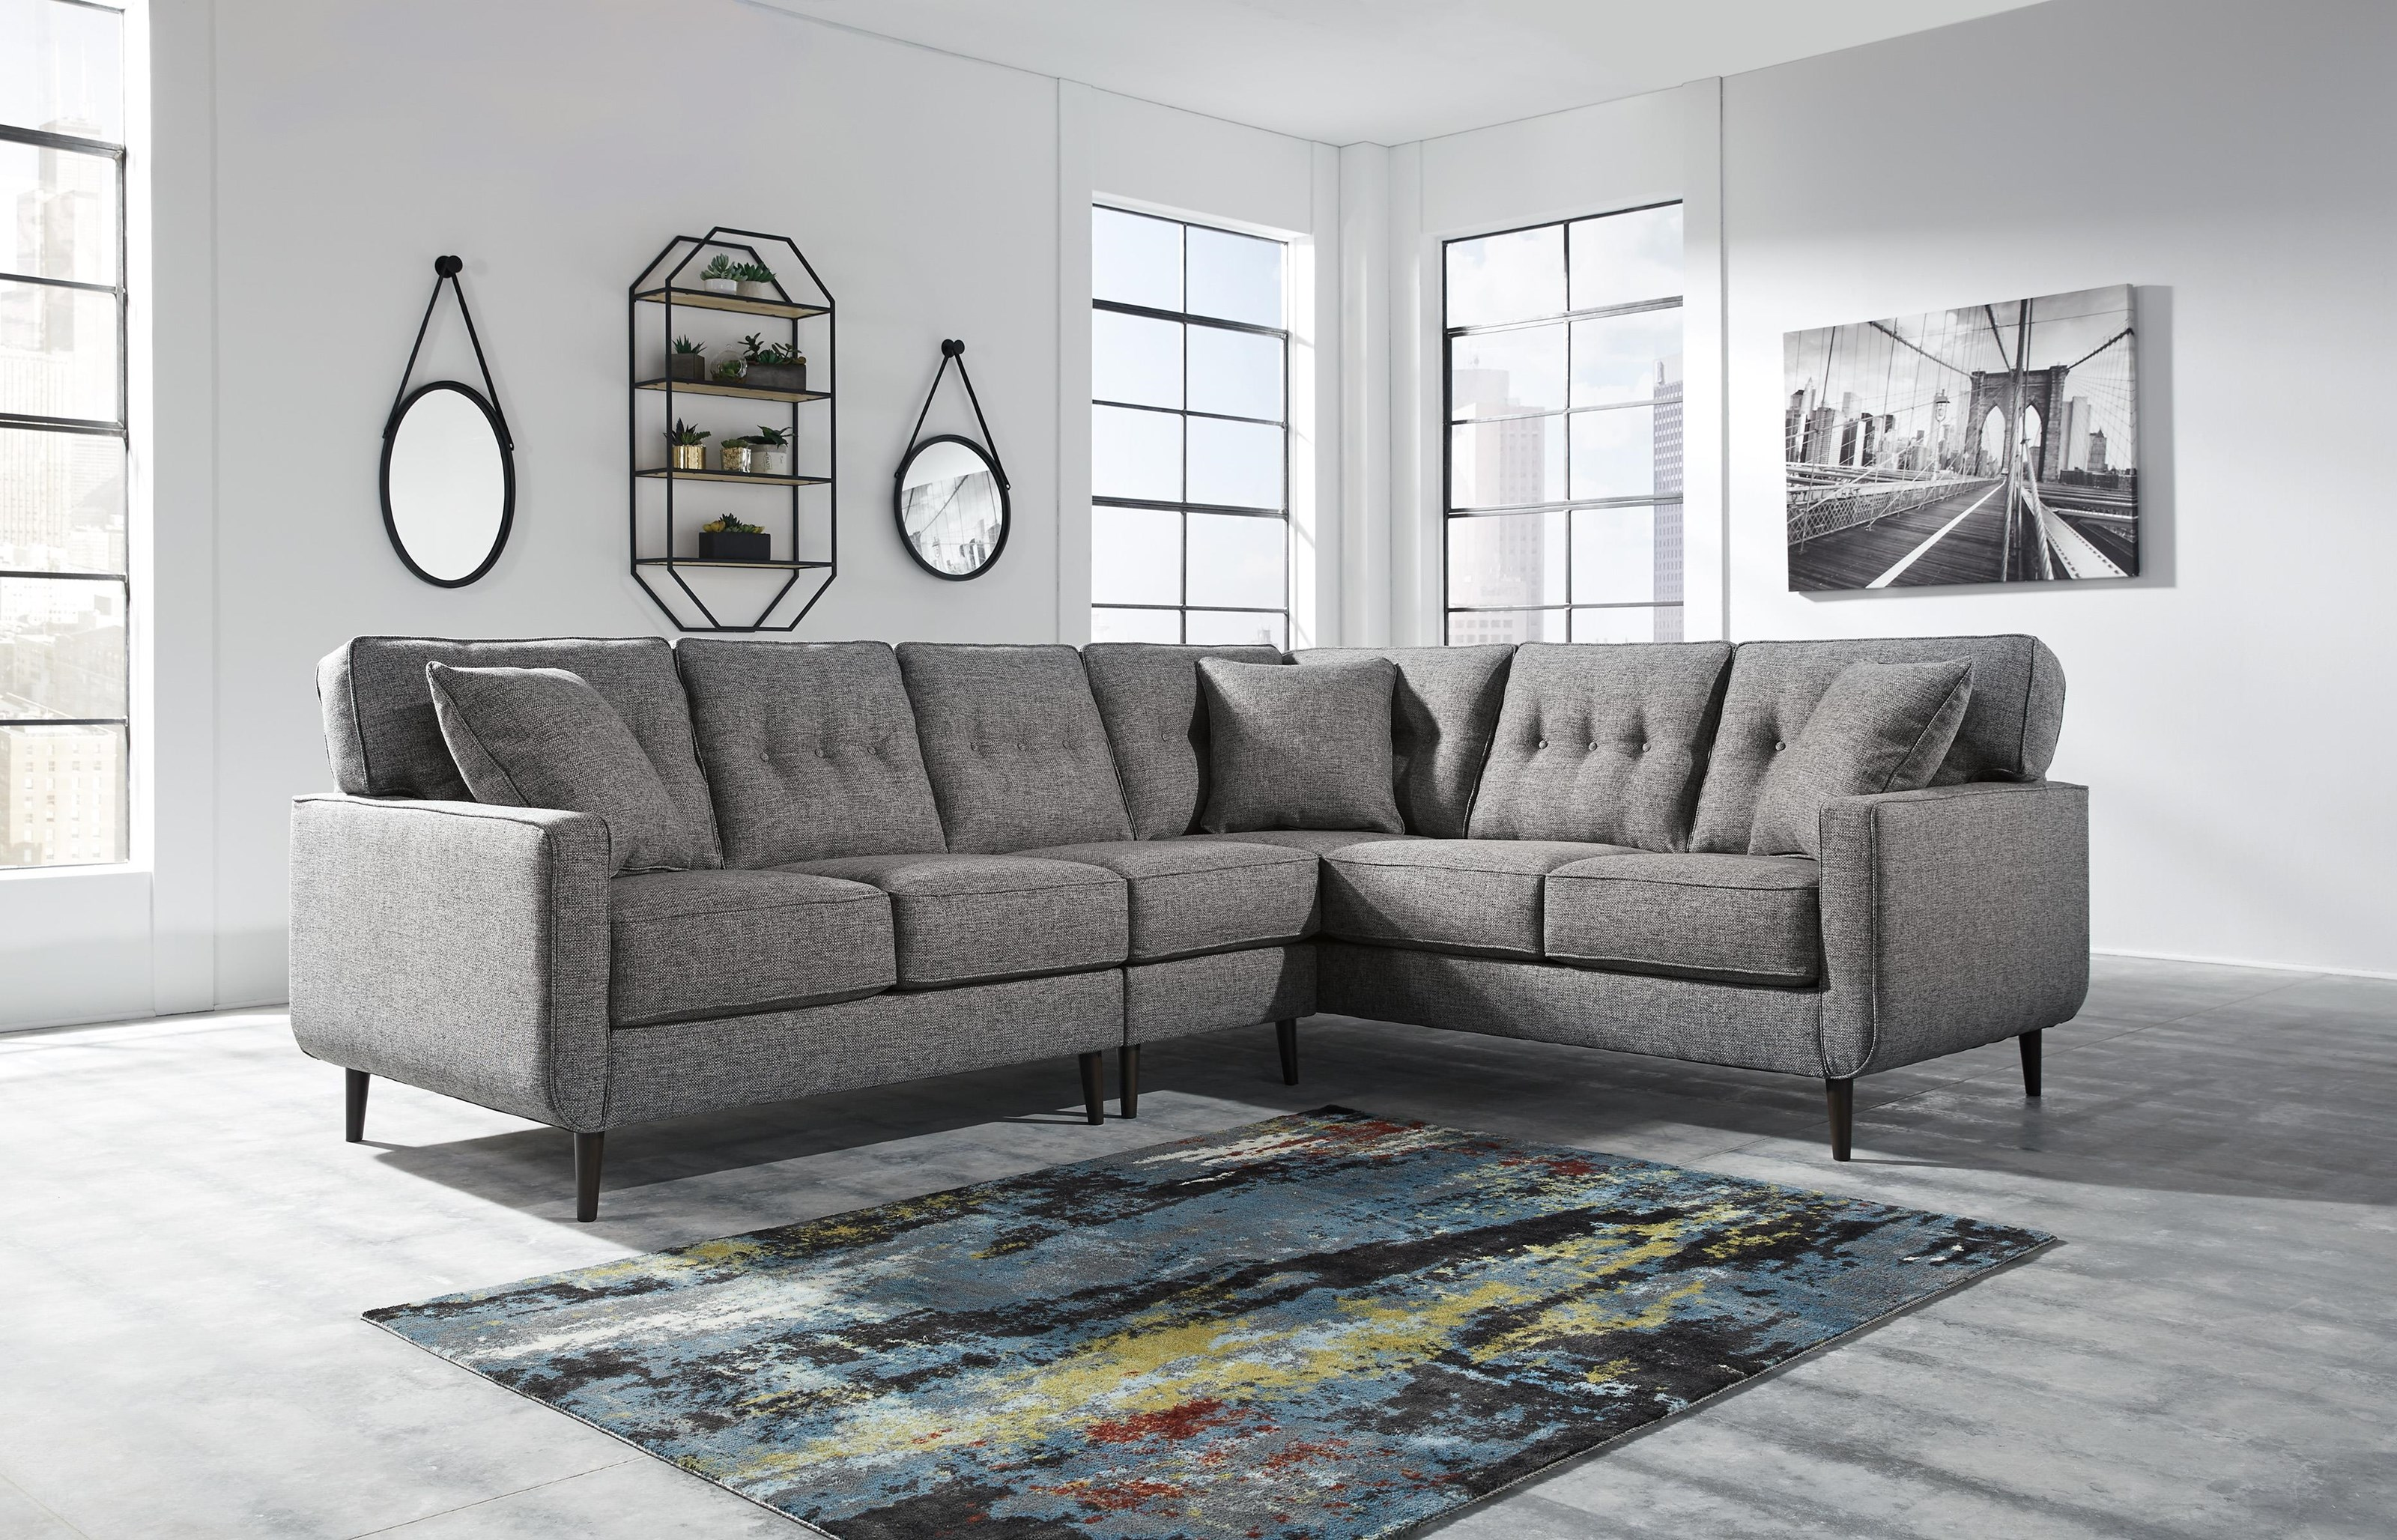 Ashley Furniture Zardoni 11402 49 55 46 3 Piece Right Arm Facing